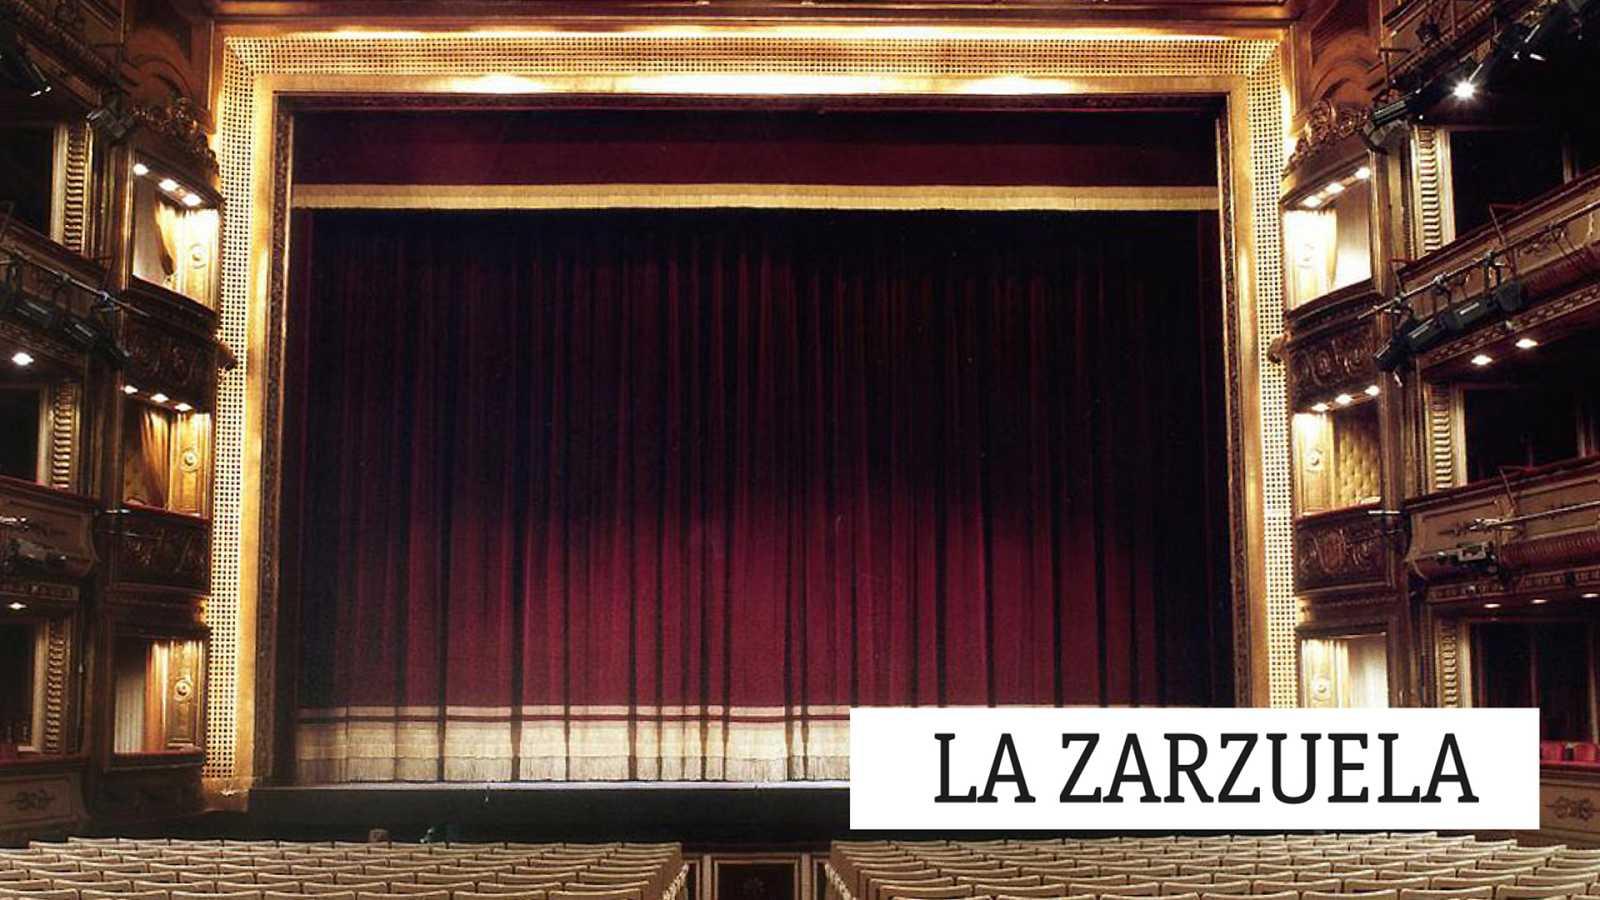 La zarzuela - Libretistas de zarzuela: Luis Fernández de Sevilla - 17/03/21 - escuchar ahora